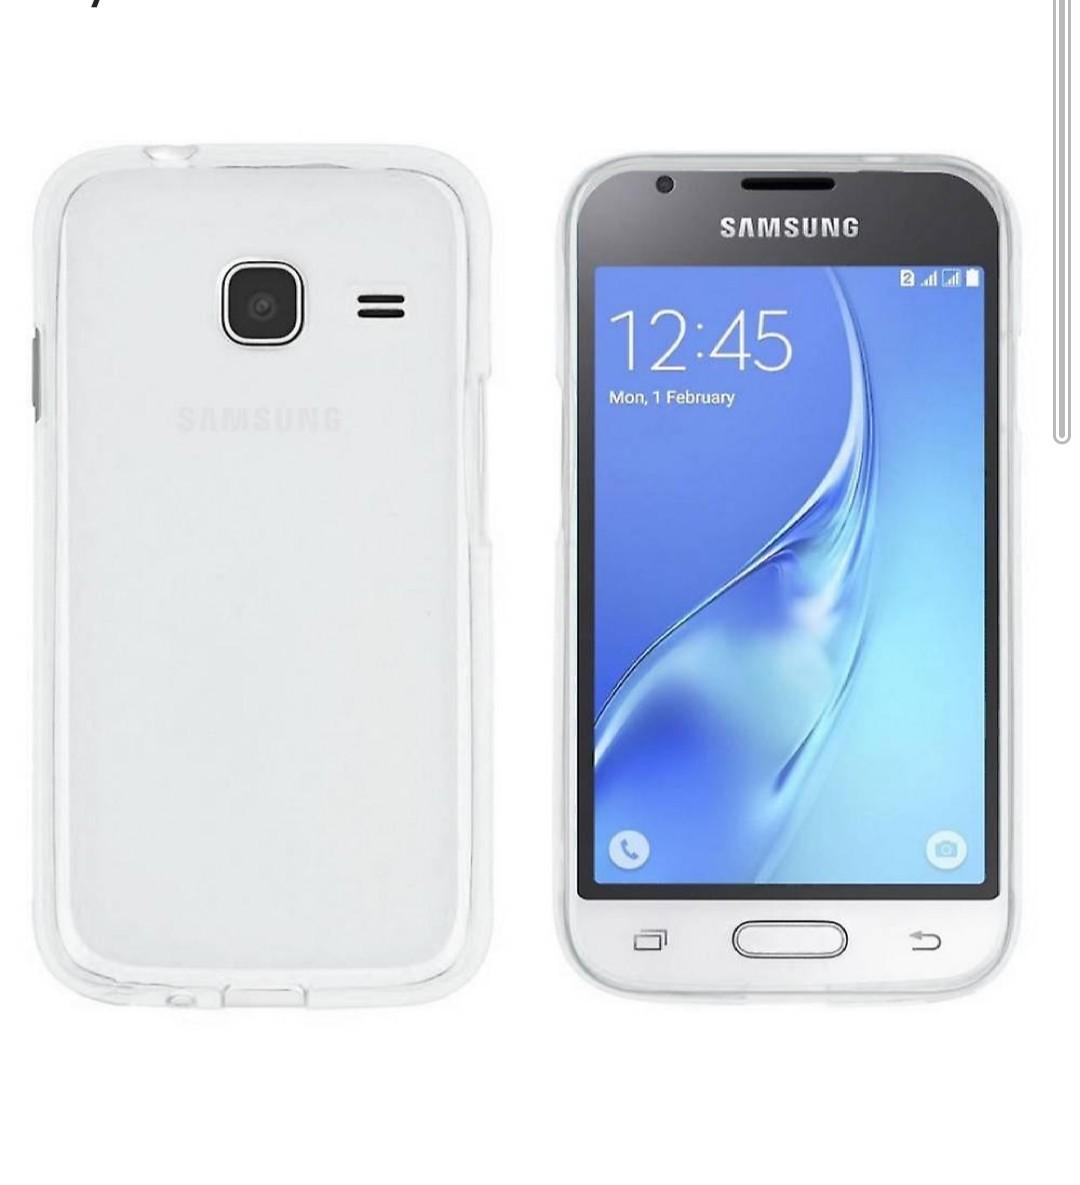 Samsung galaxy j1 mini white & black